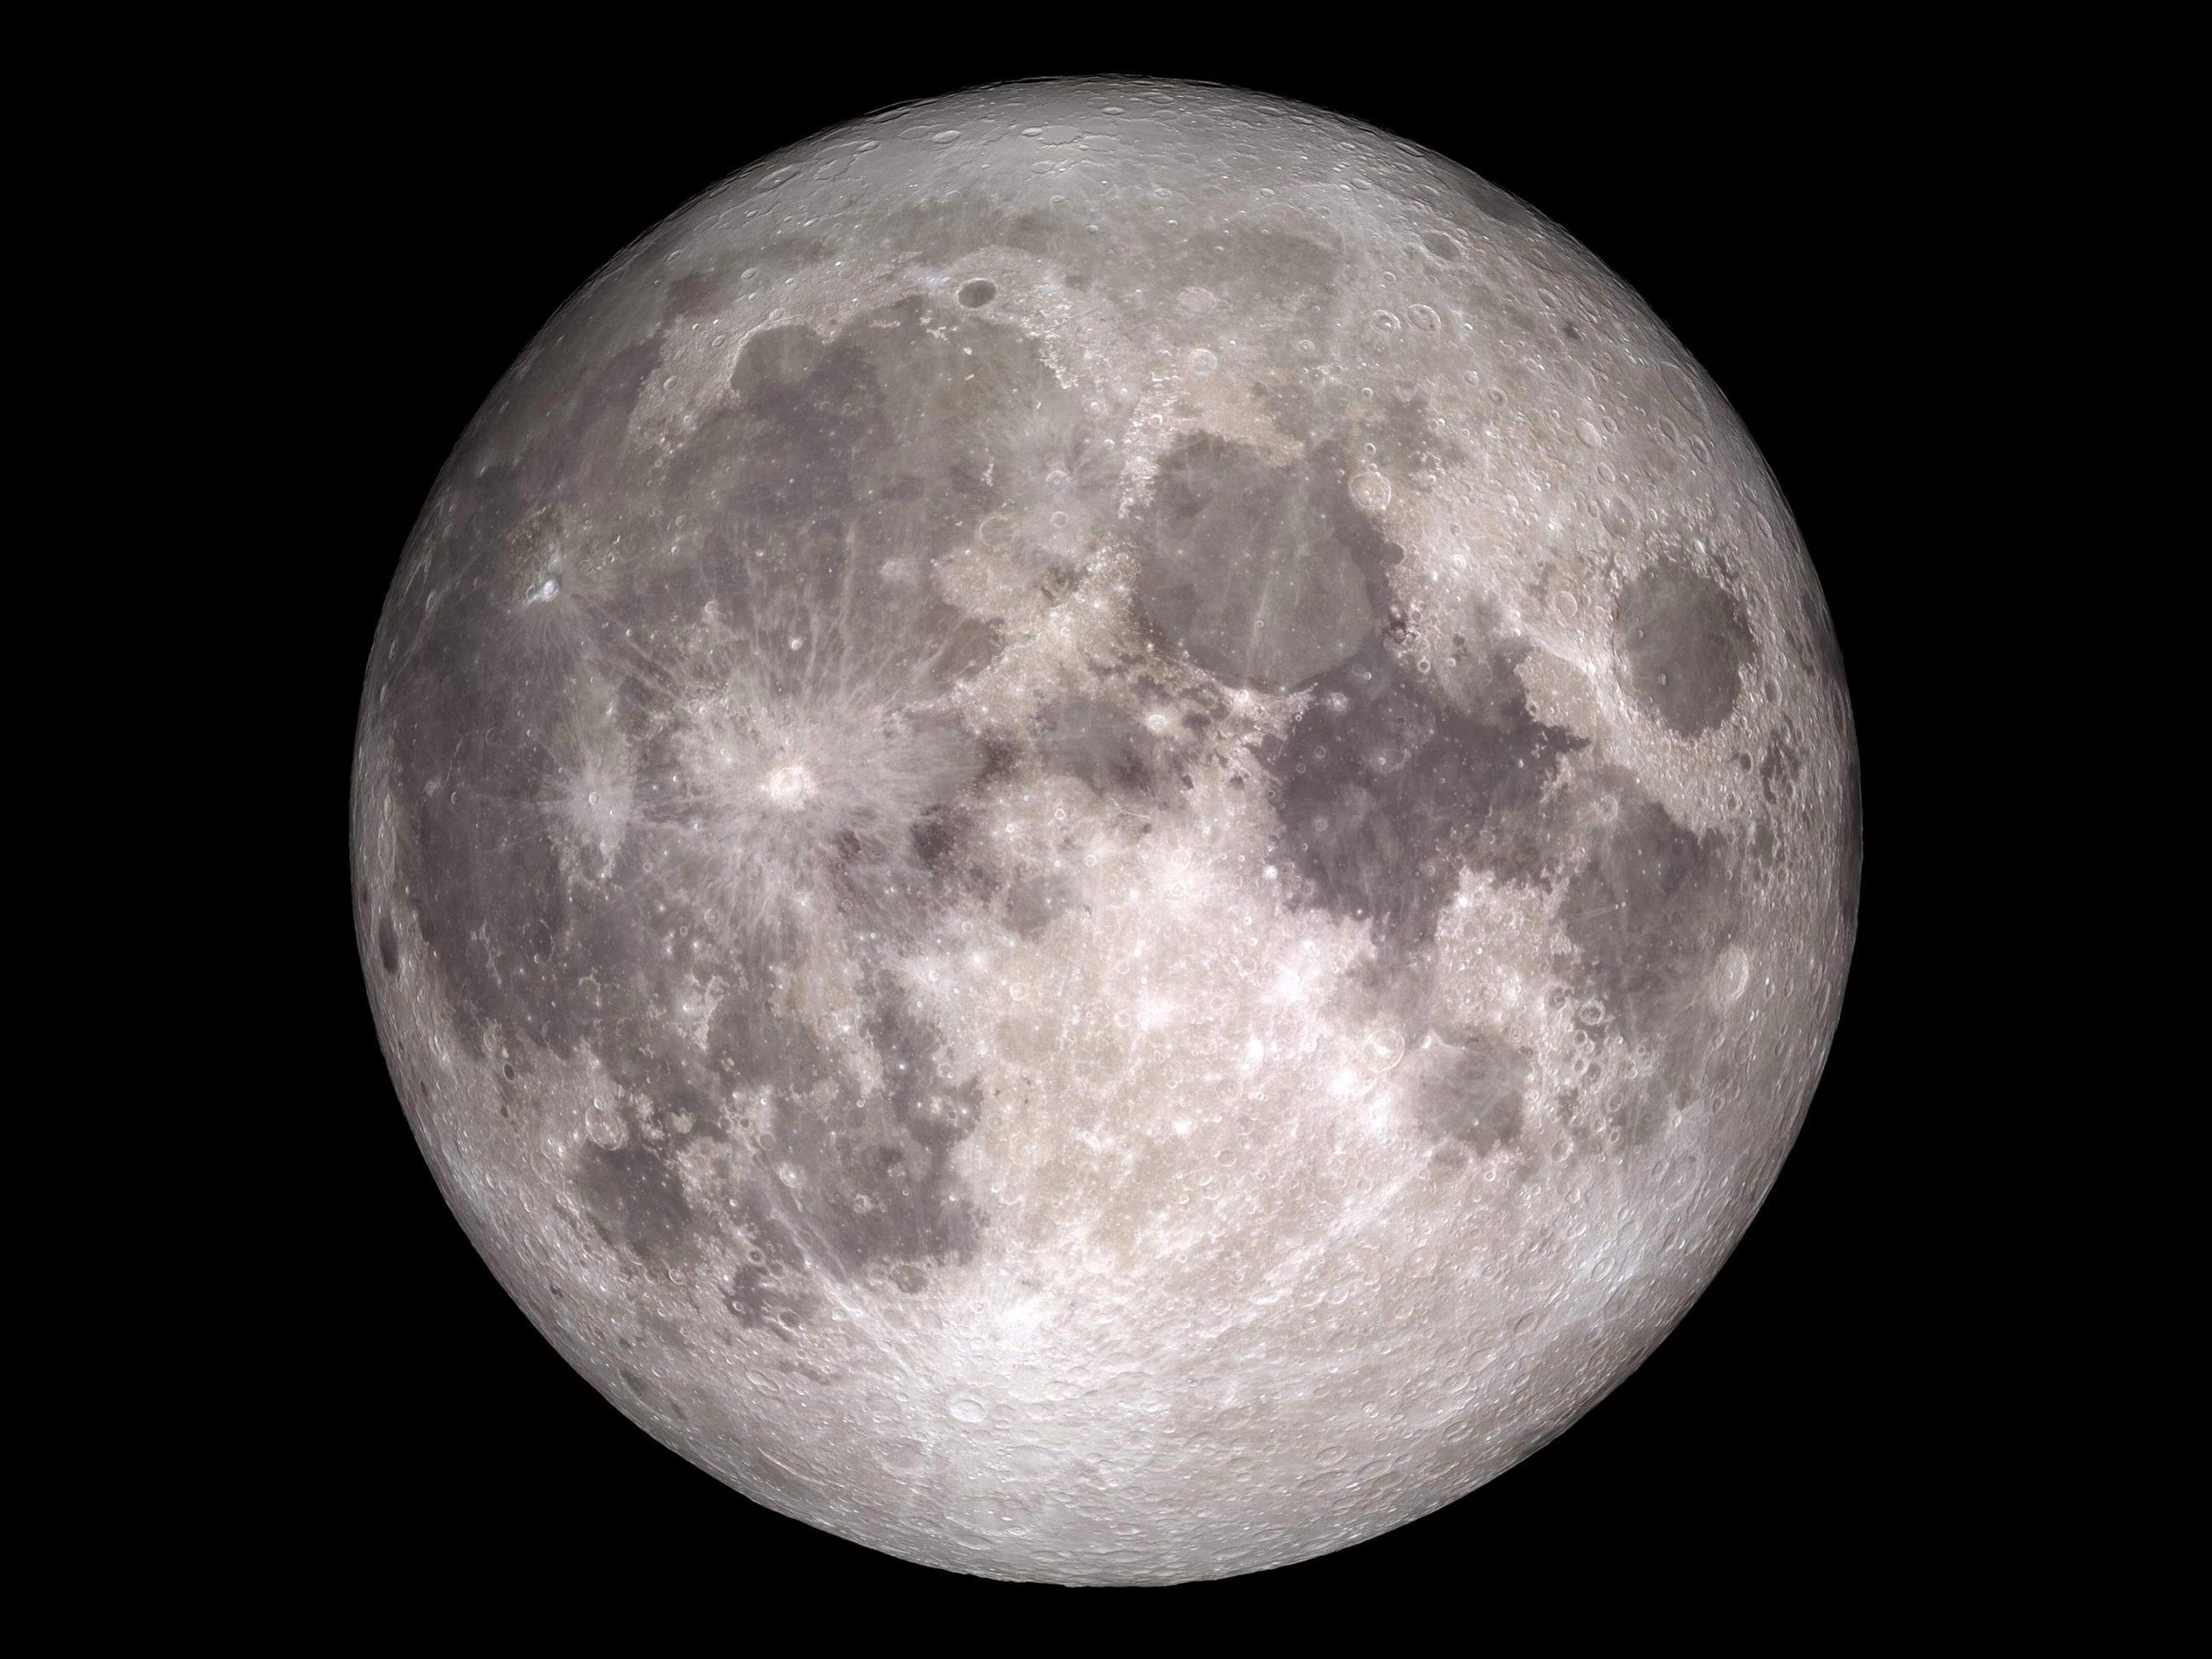 Lunar-Reconnaissance-Orbiter-Moon-scaled.jpg